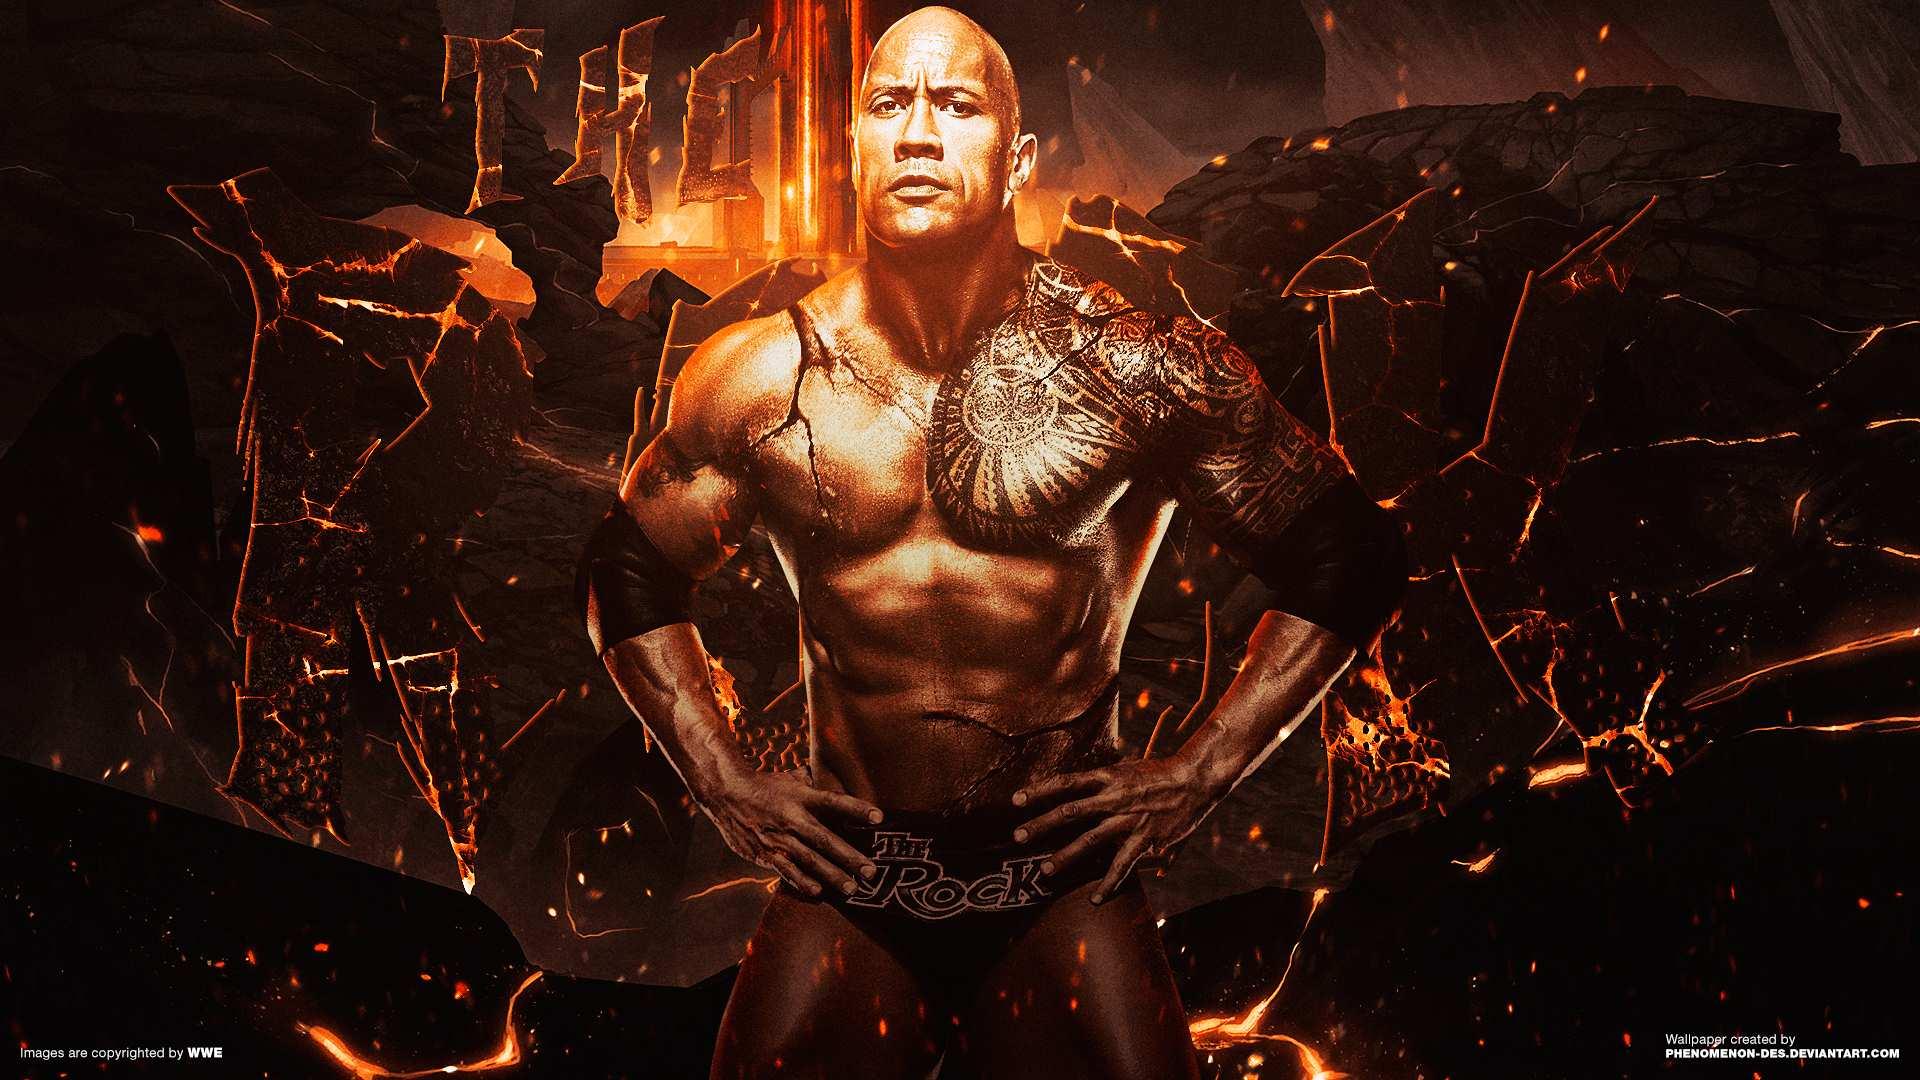 Dwayne Johnson Wallpaper For Computer: WWE 2016 Wallpapers